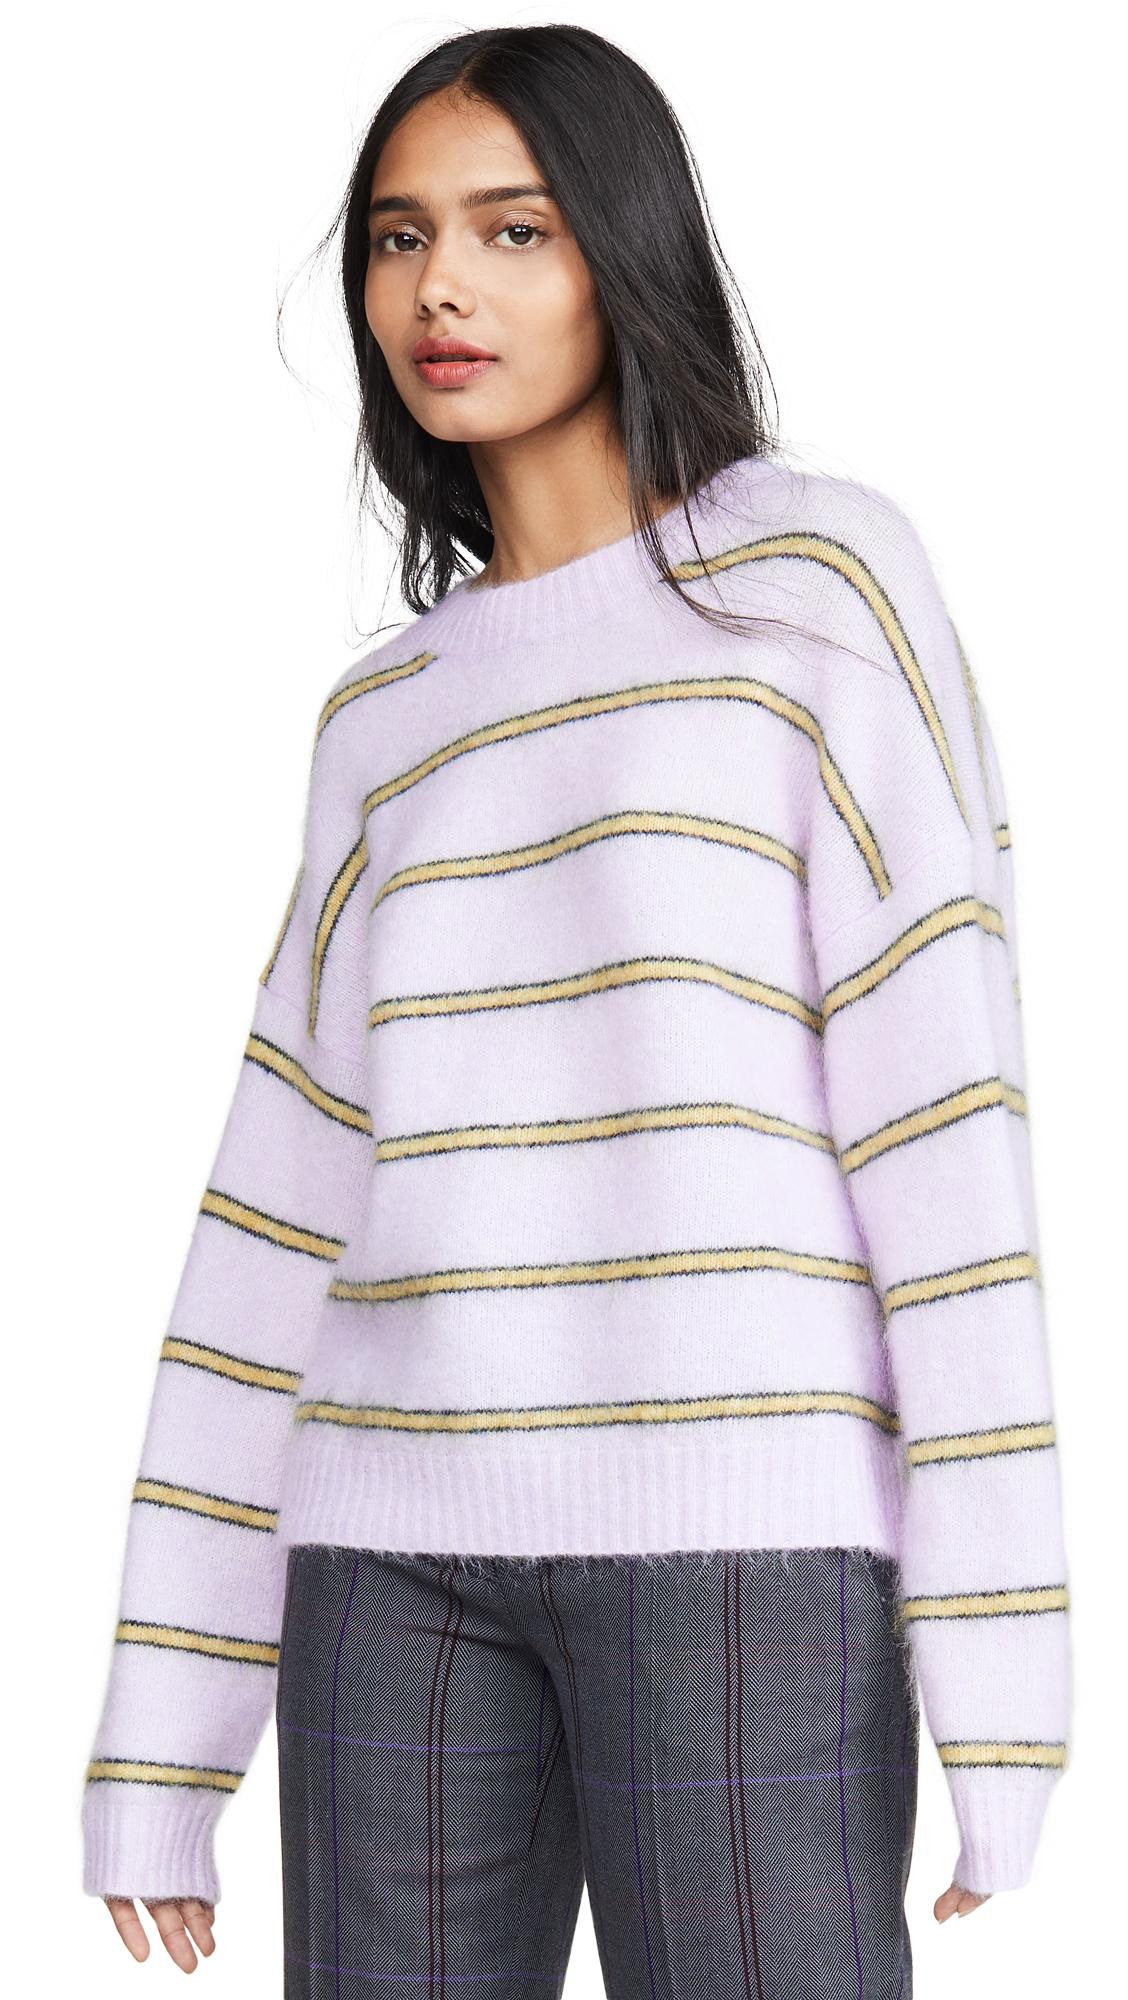 Acne Studios Khira Moh Knitwear Sweater - Lilac/Mustard